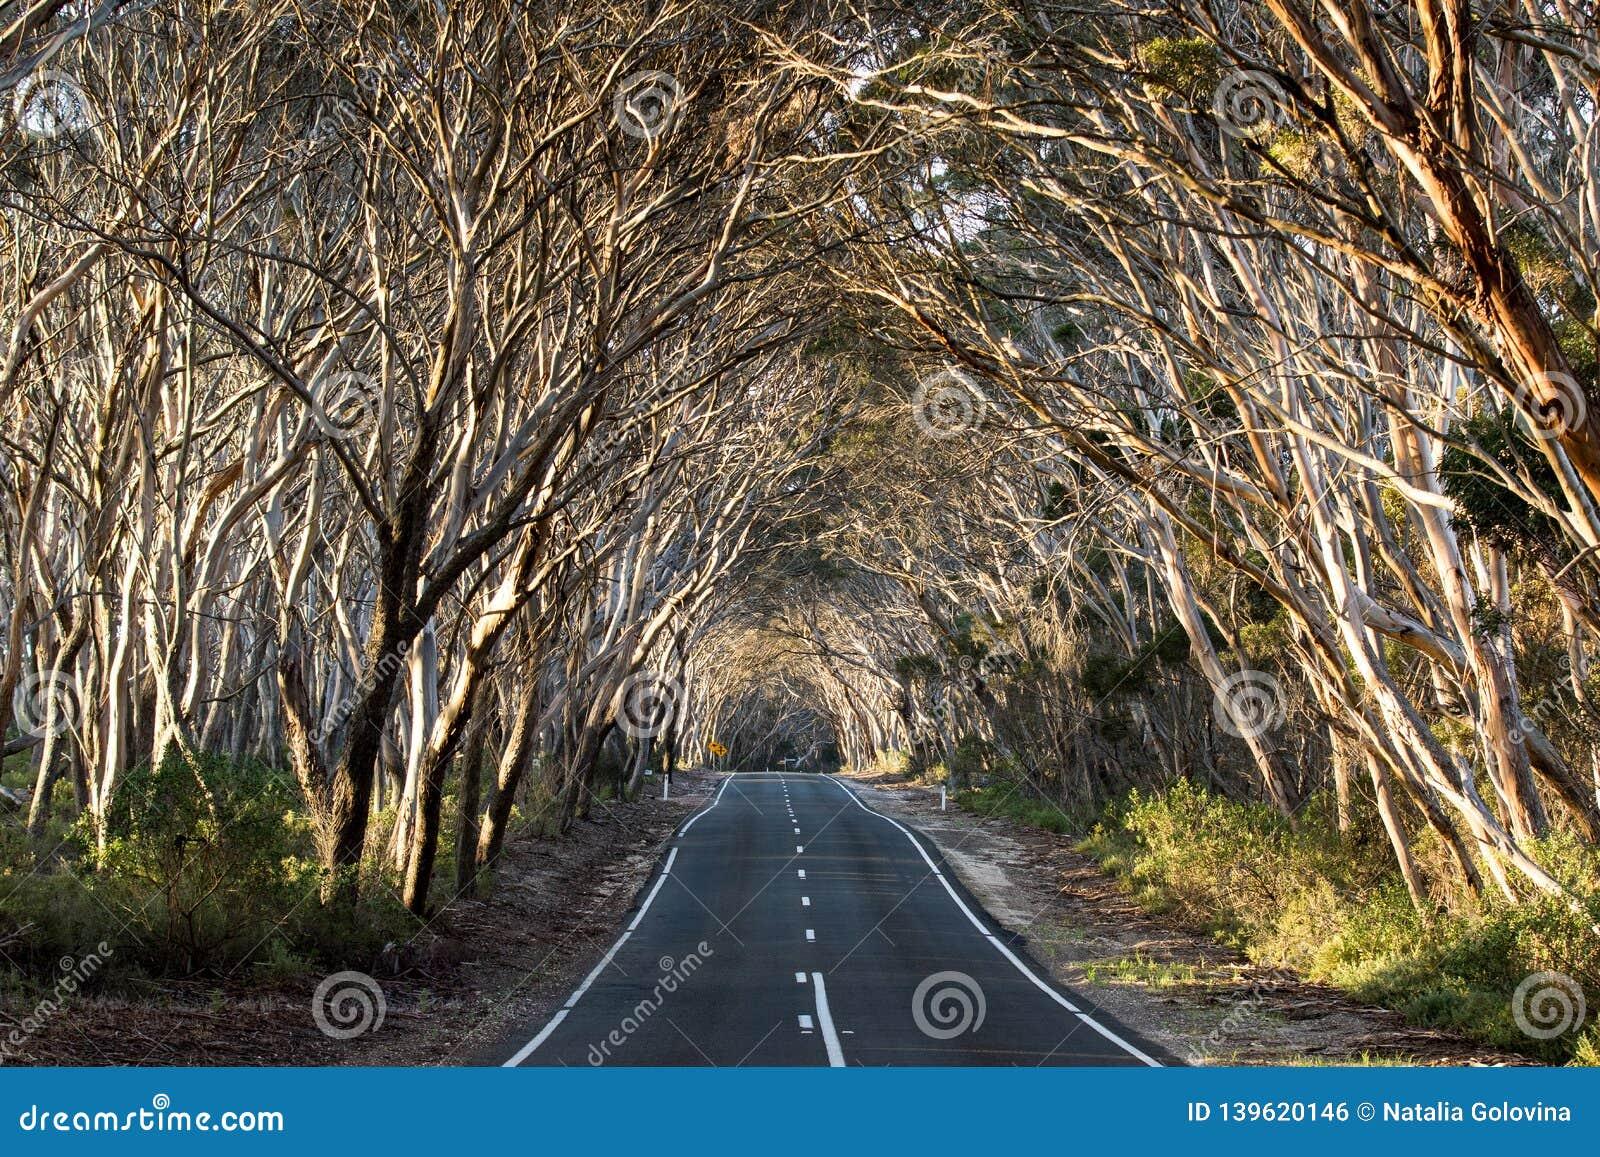 Empty road through the eucalyptus wood. Australia. Sunny day